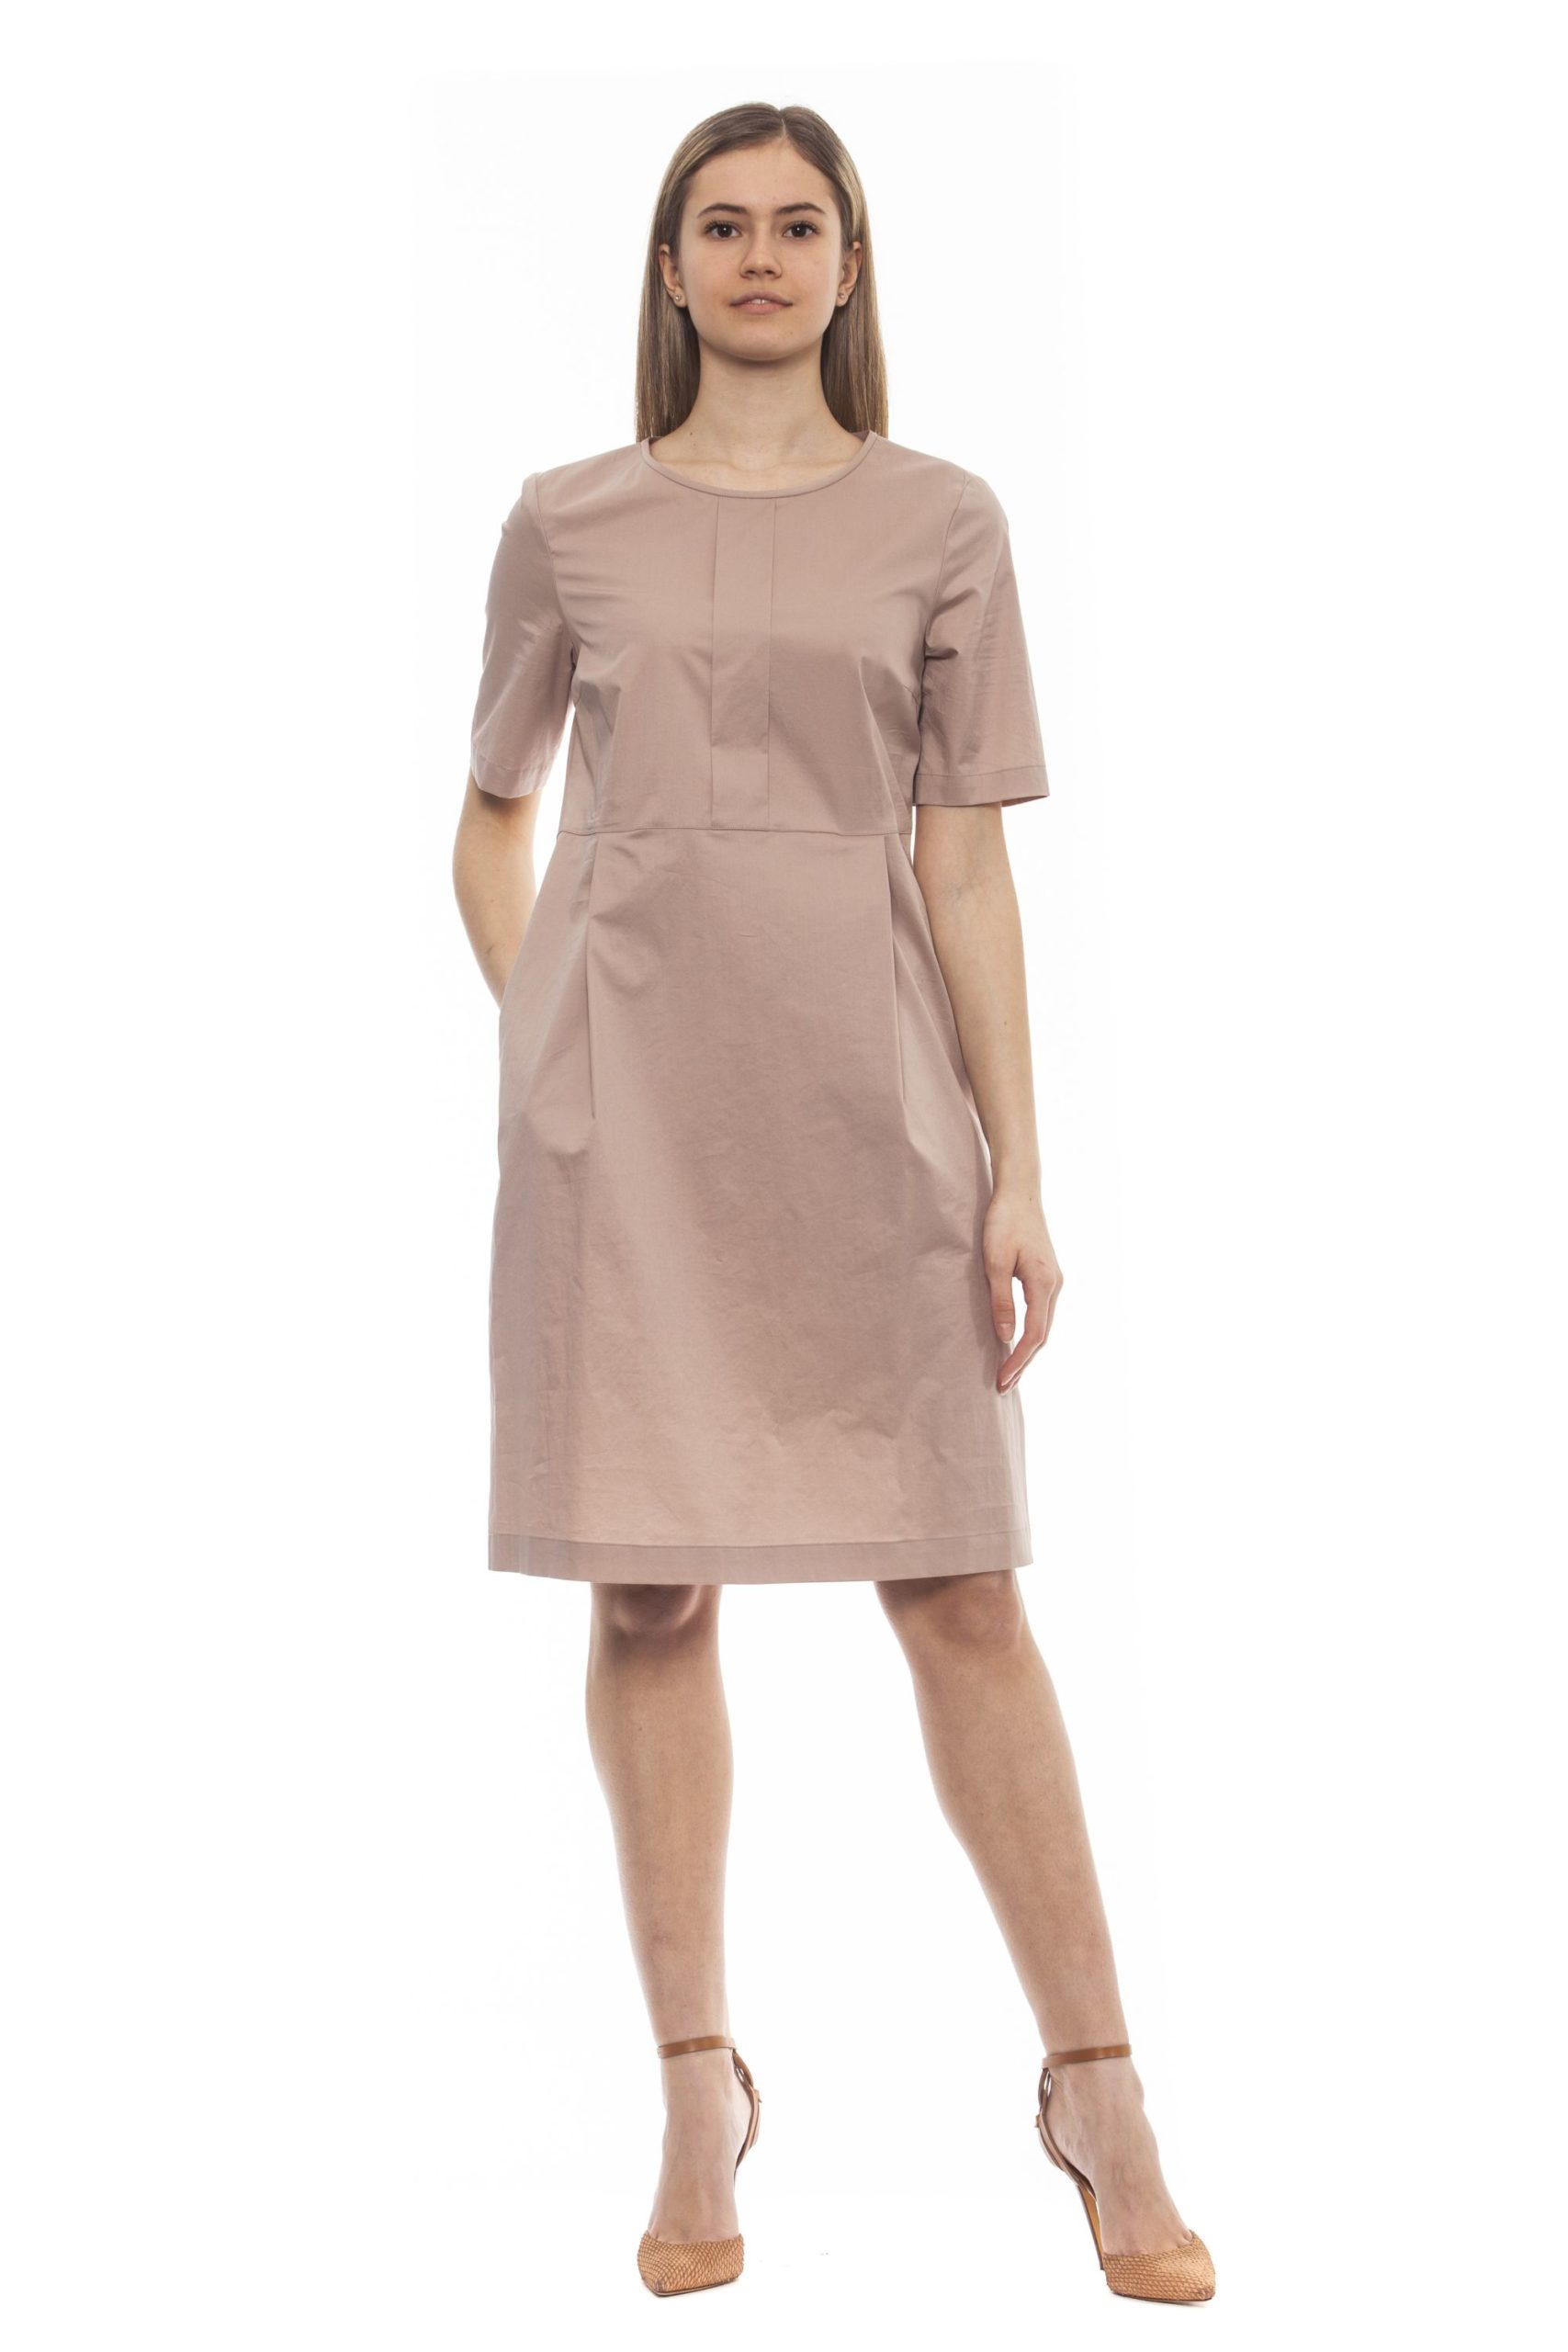 Peserico Women's Rosa Dress Pink PE1383216 - IT42 | S